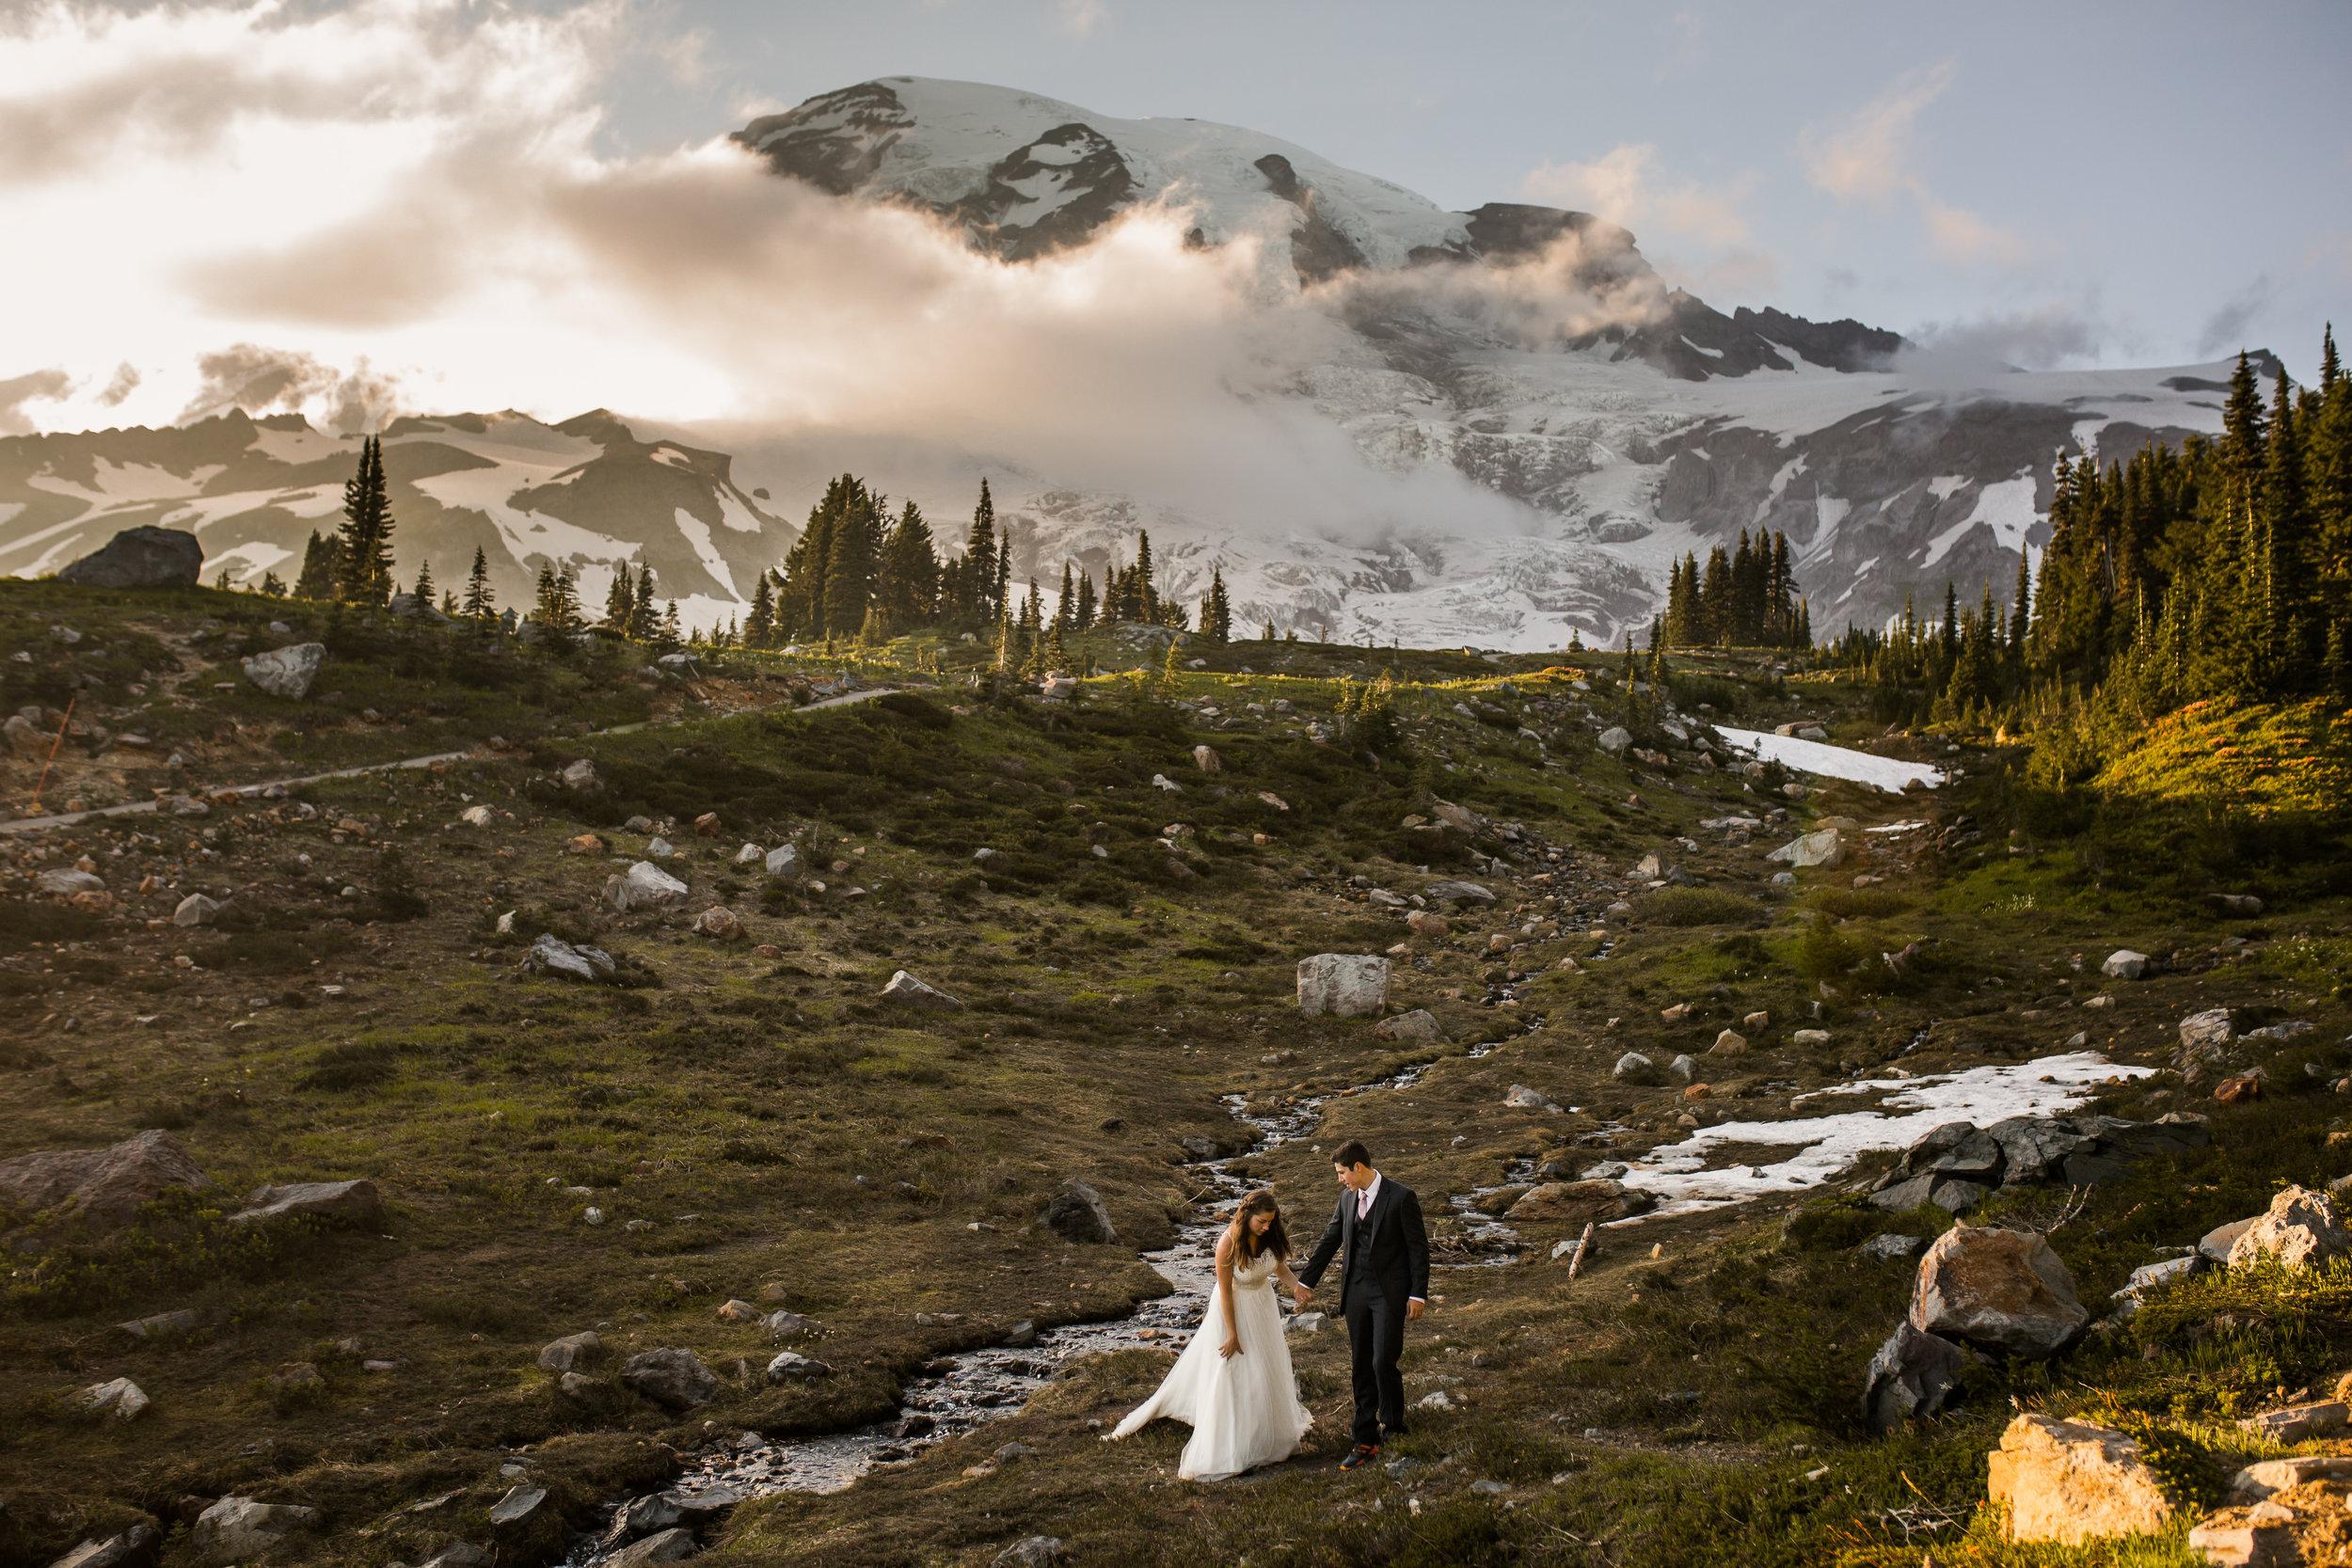 Nicole-Daacke-Photography-Mt-Rainier-elopement-photographer-washington-mountain-epic-wedding-photography-wildflowers-at-rainier-pine-tree-cloudy-summer-day-at-mountain-rainier-37.jpg